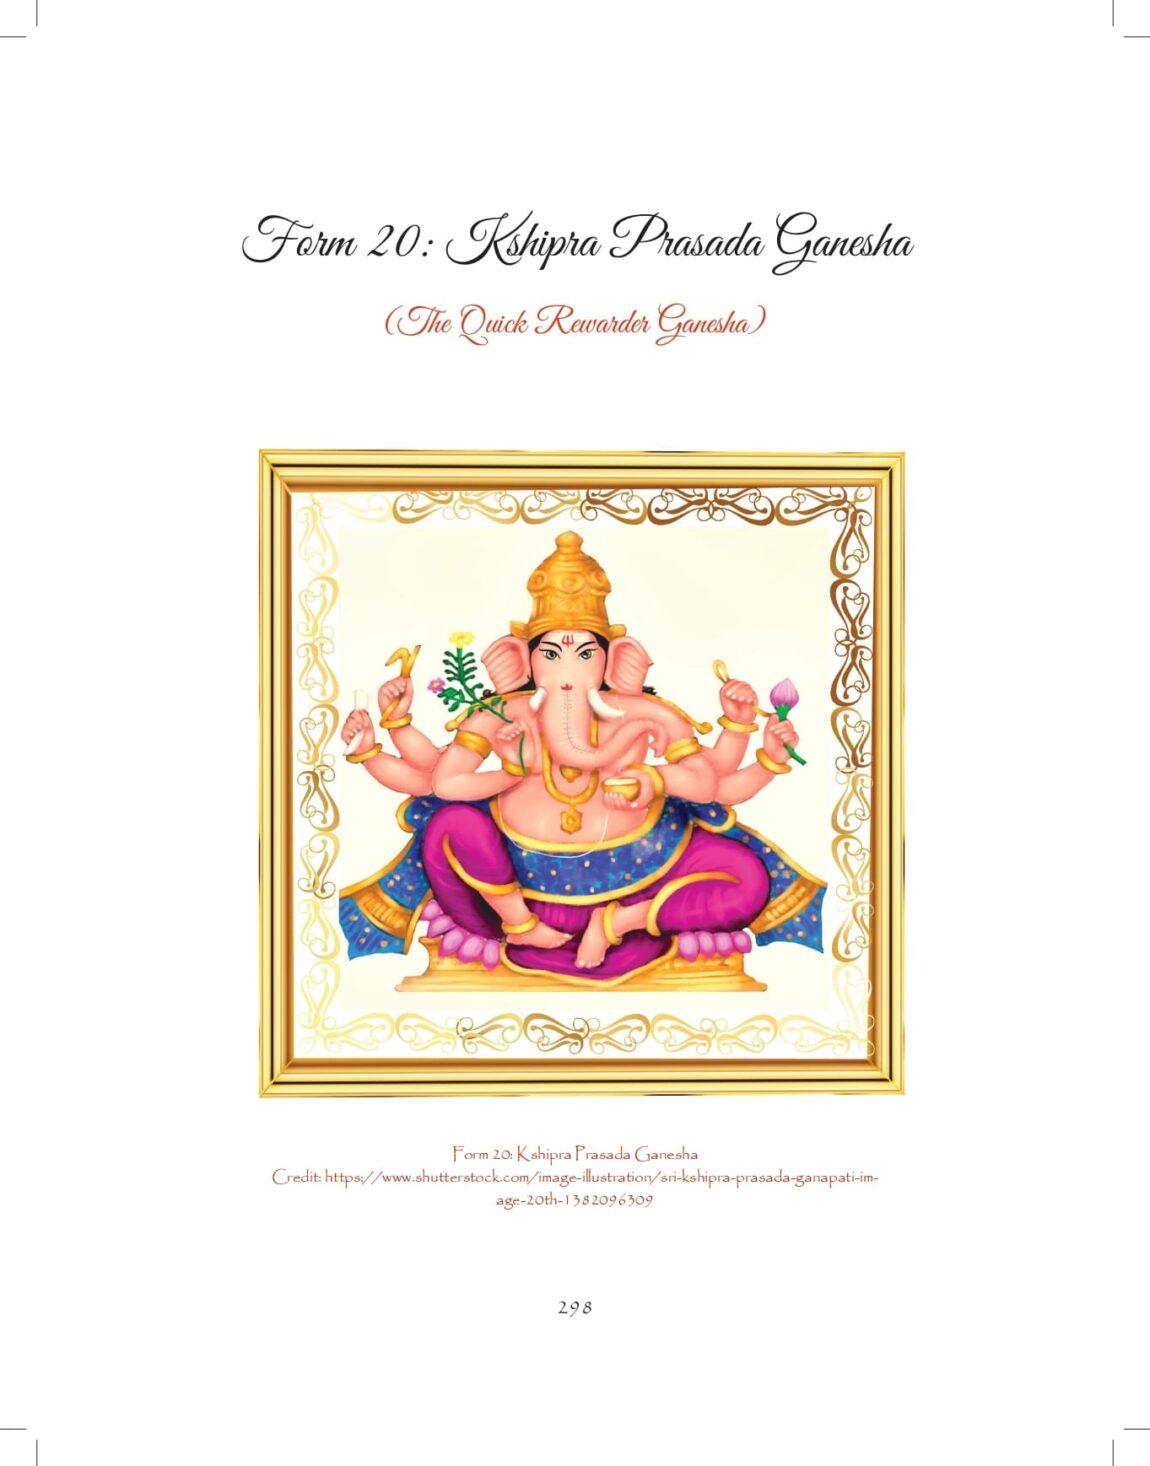 Ganesh-print_pages-to-jpg-0298.jpg